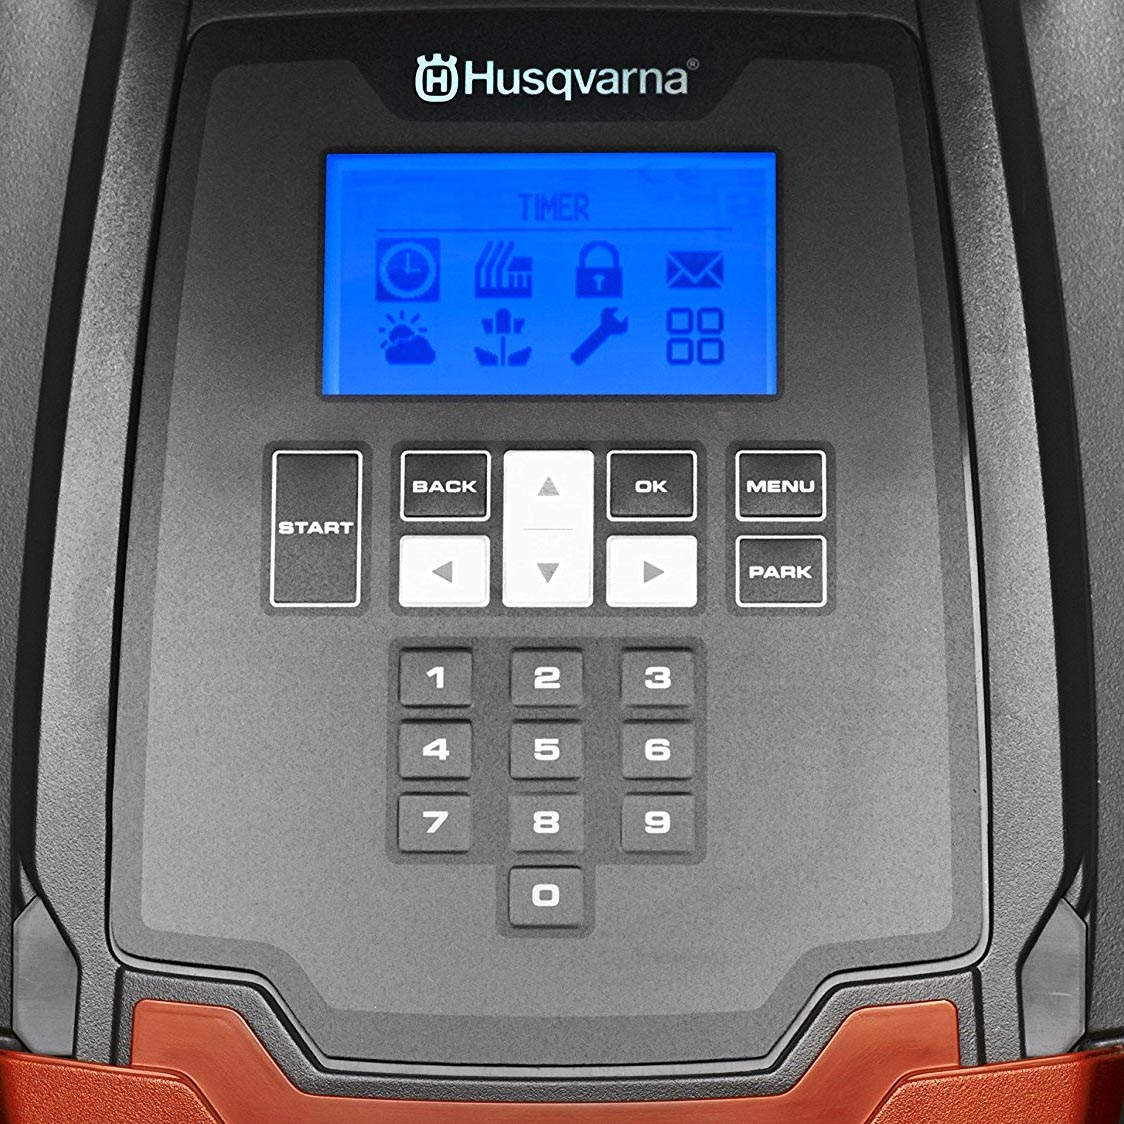 husqvarna automower 315 automatic robotic lawn mower w free medium install kit 842372125628 ebay. Black Bedroom Furniture Sets. Home Design Ideas